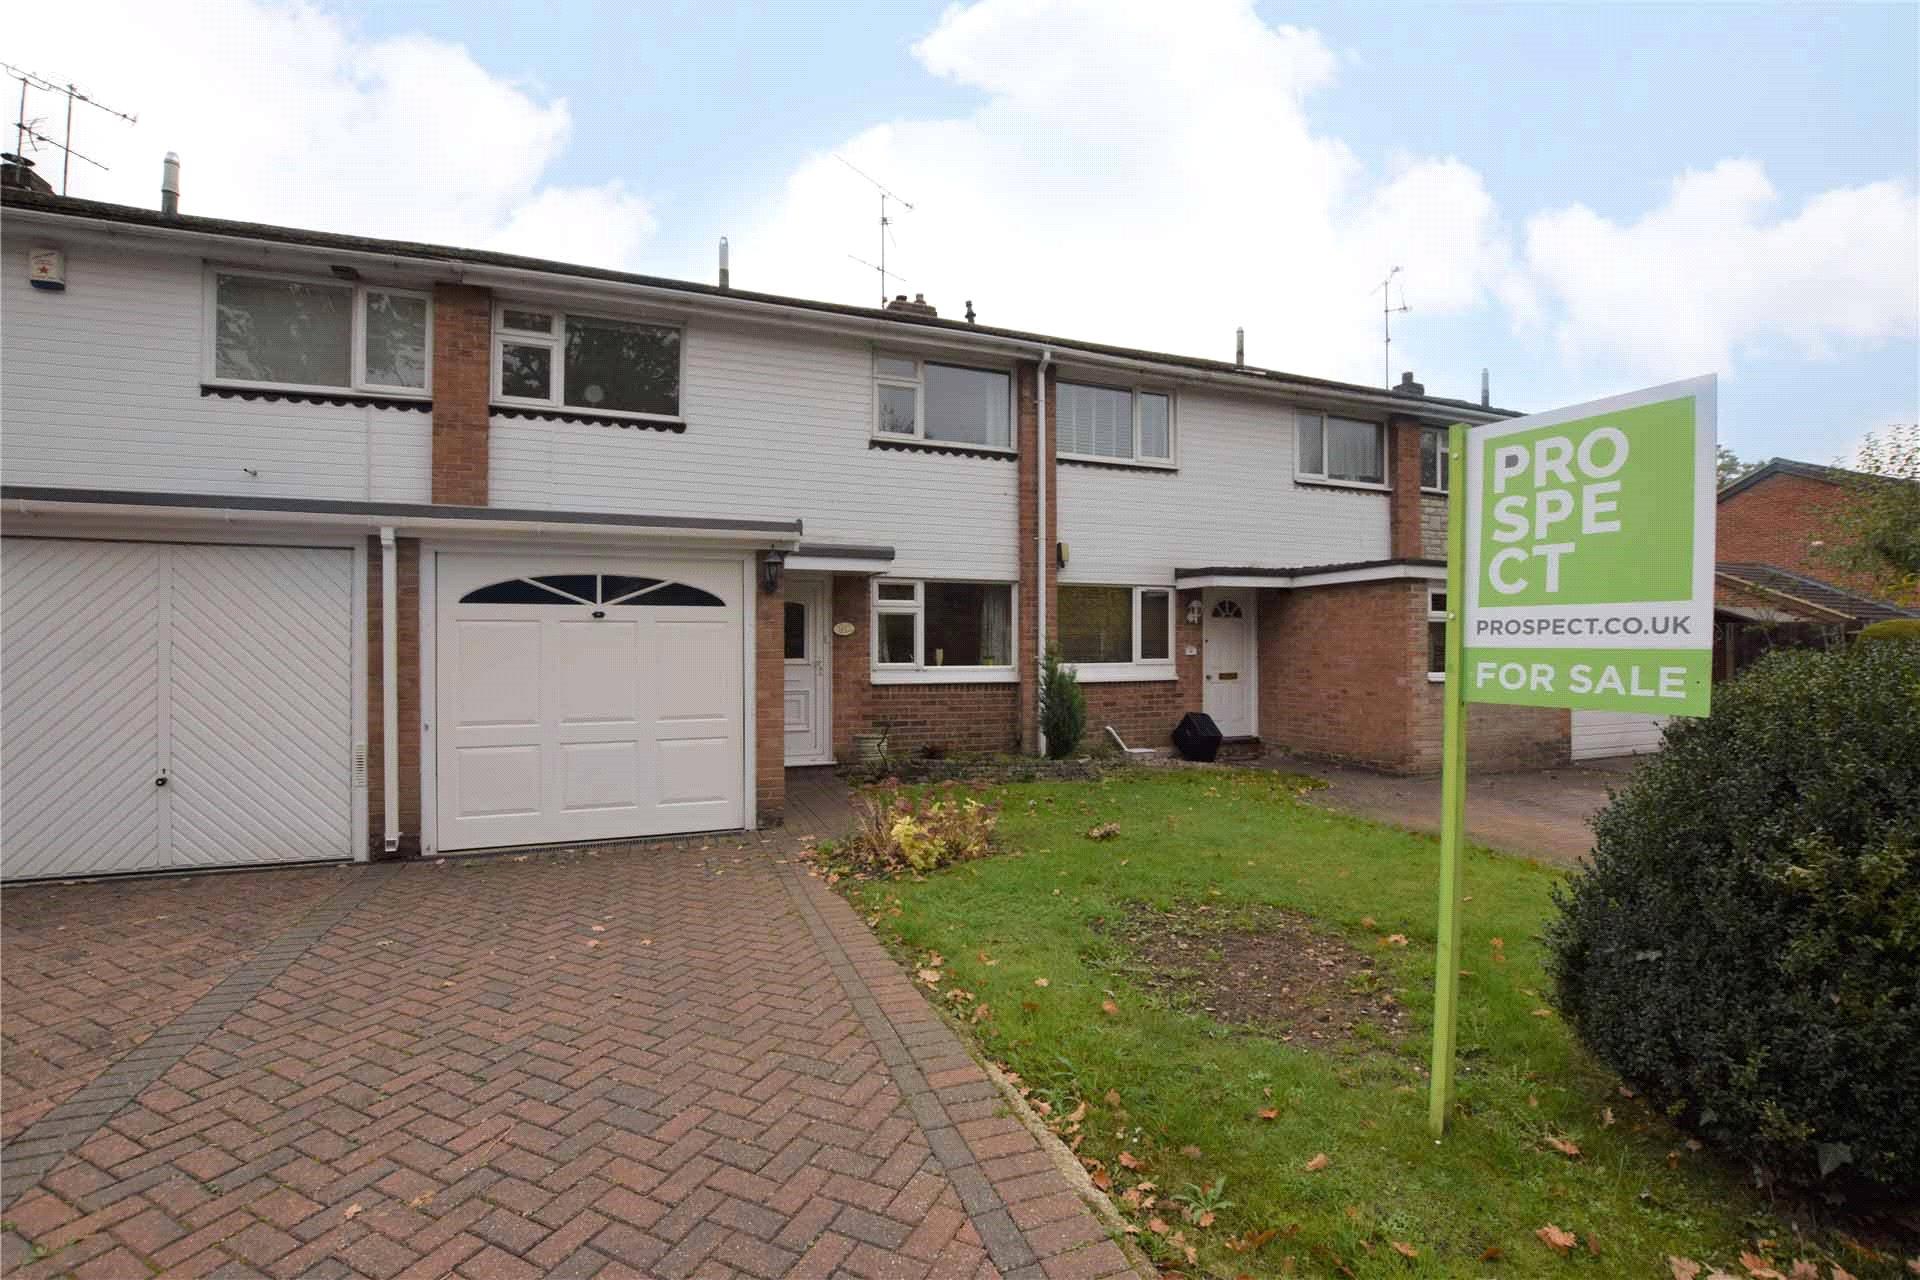 3 Bedrooms Terraced House for sale in Bathurst Road, Winnersh, Wokingham, Berkshire, RG41